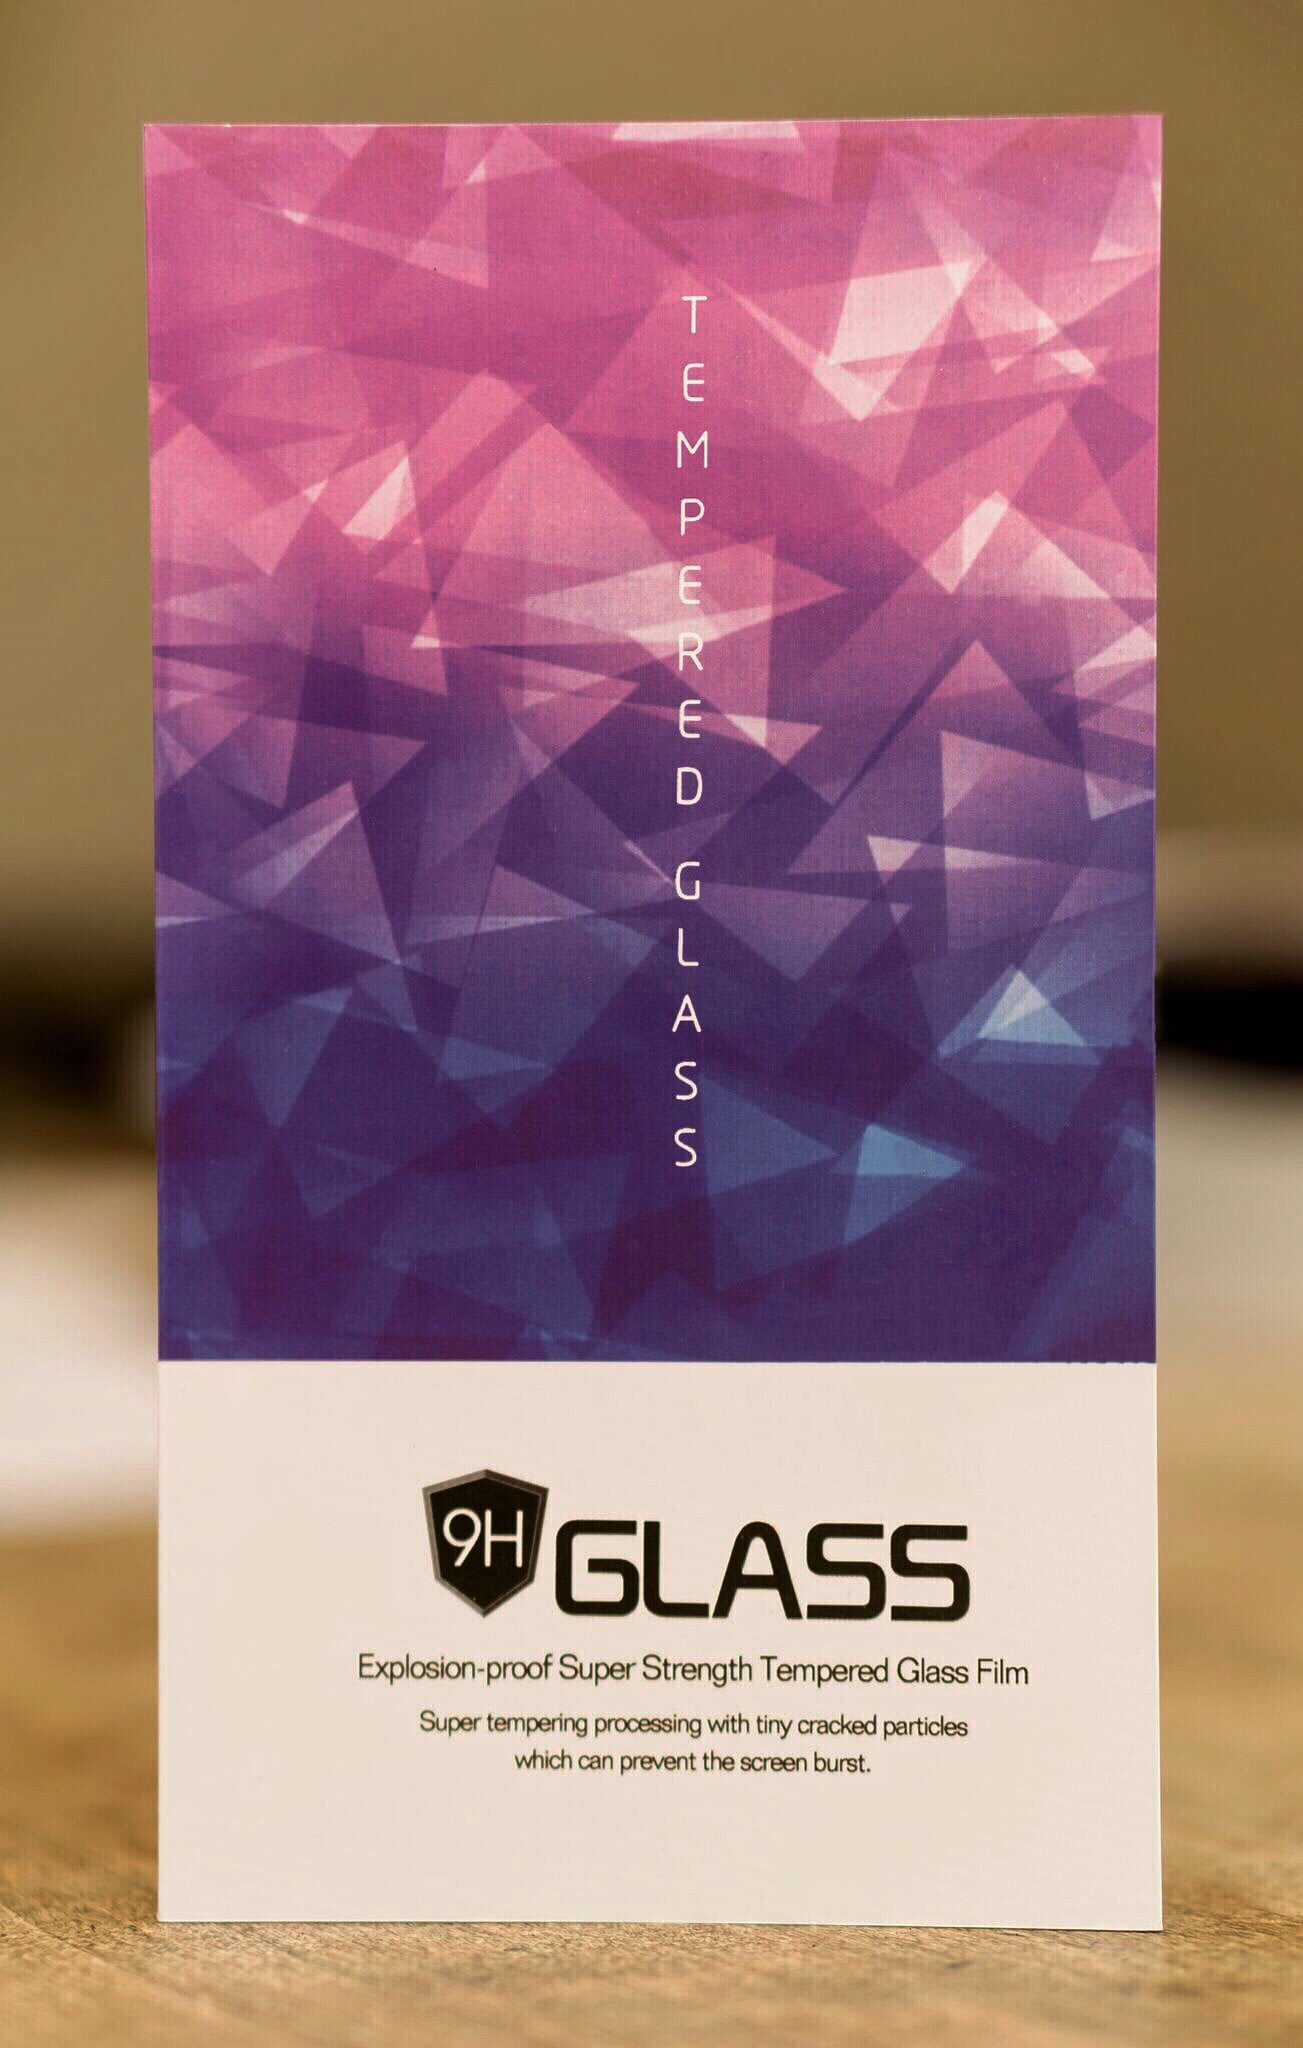 Tempered glass Samsung Gear S2